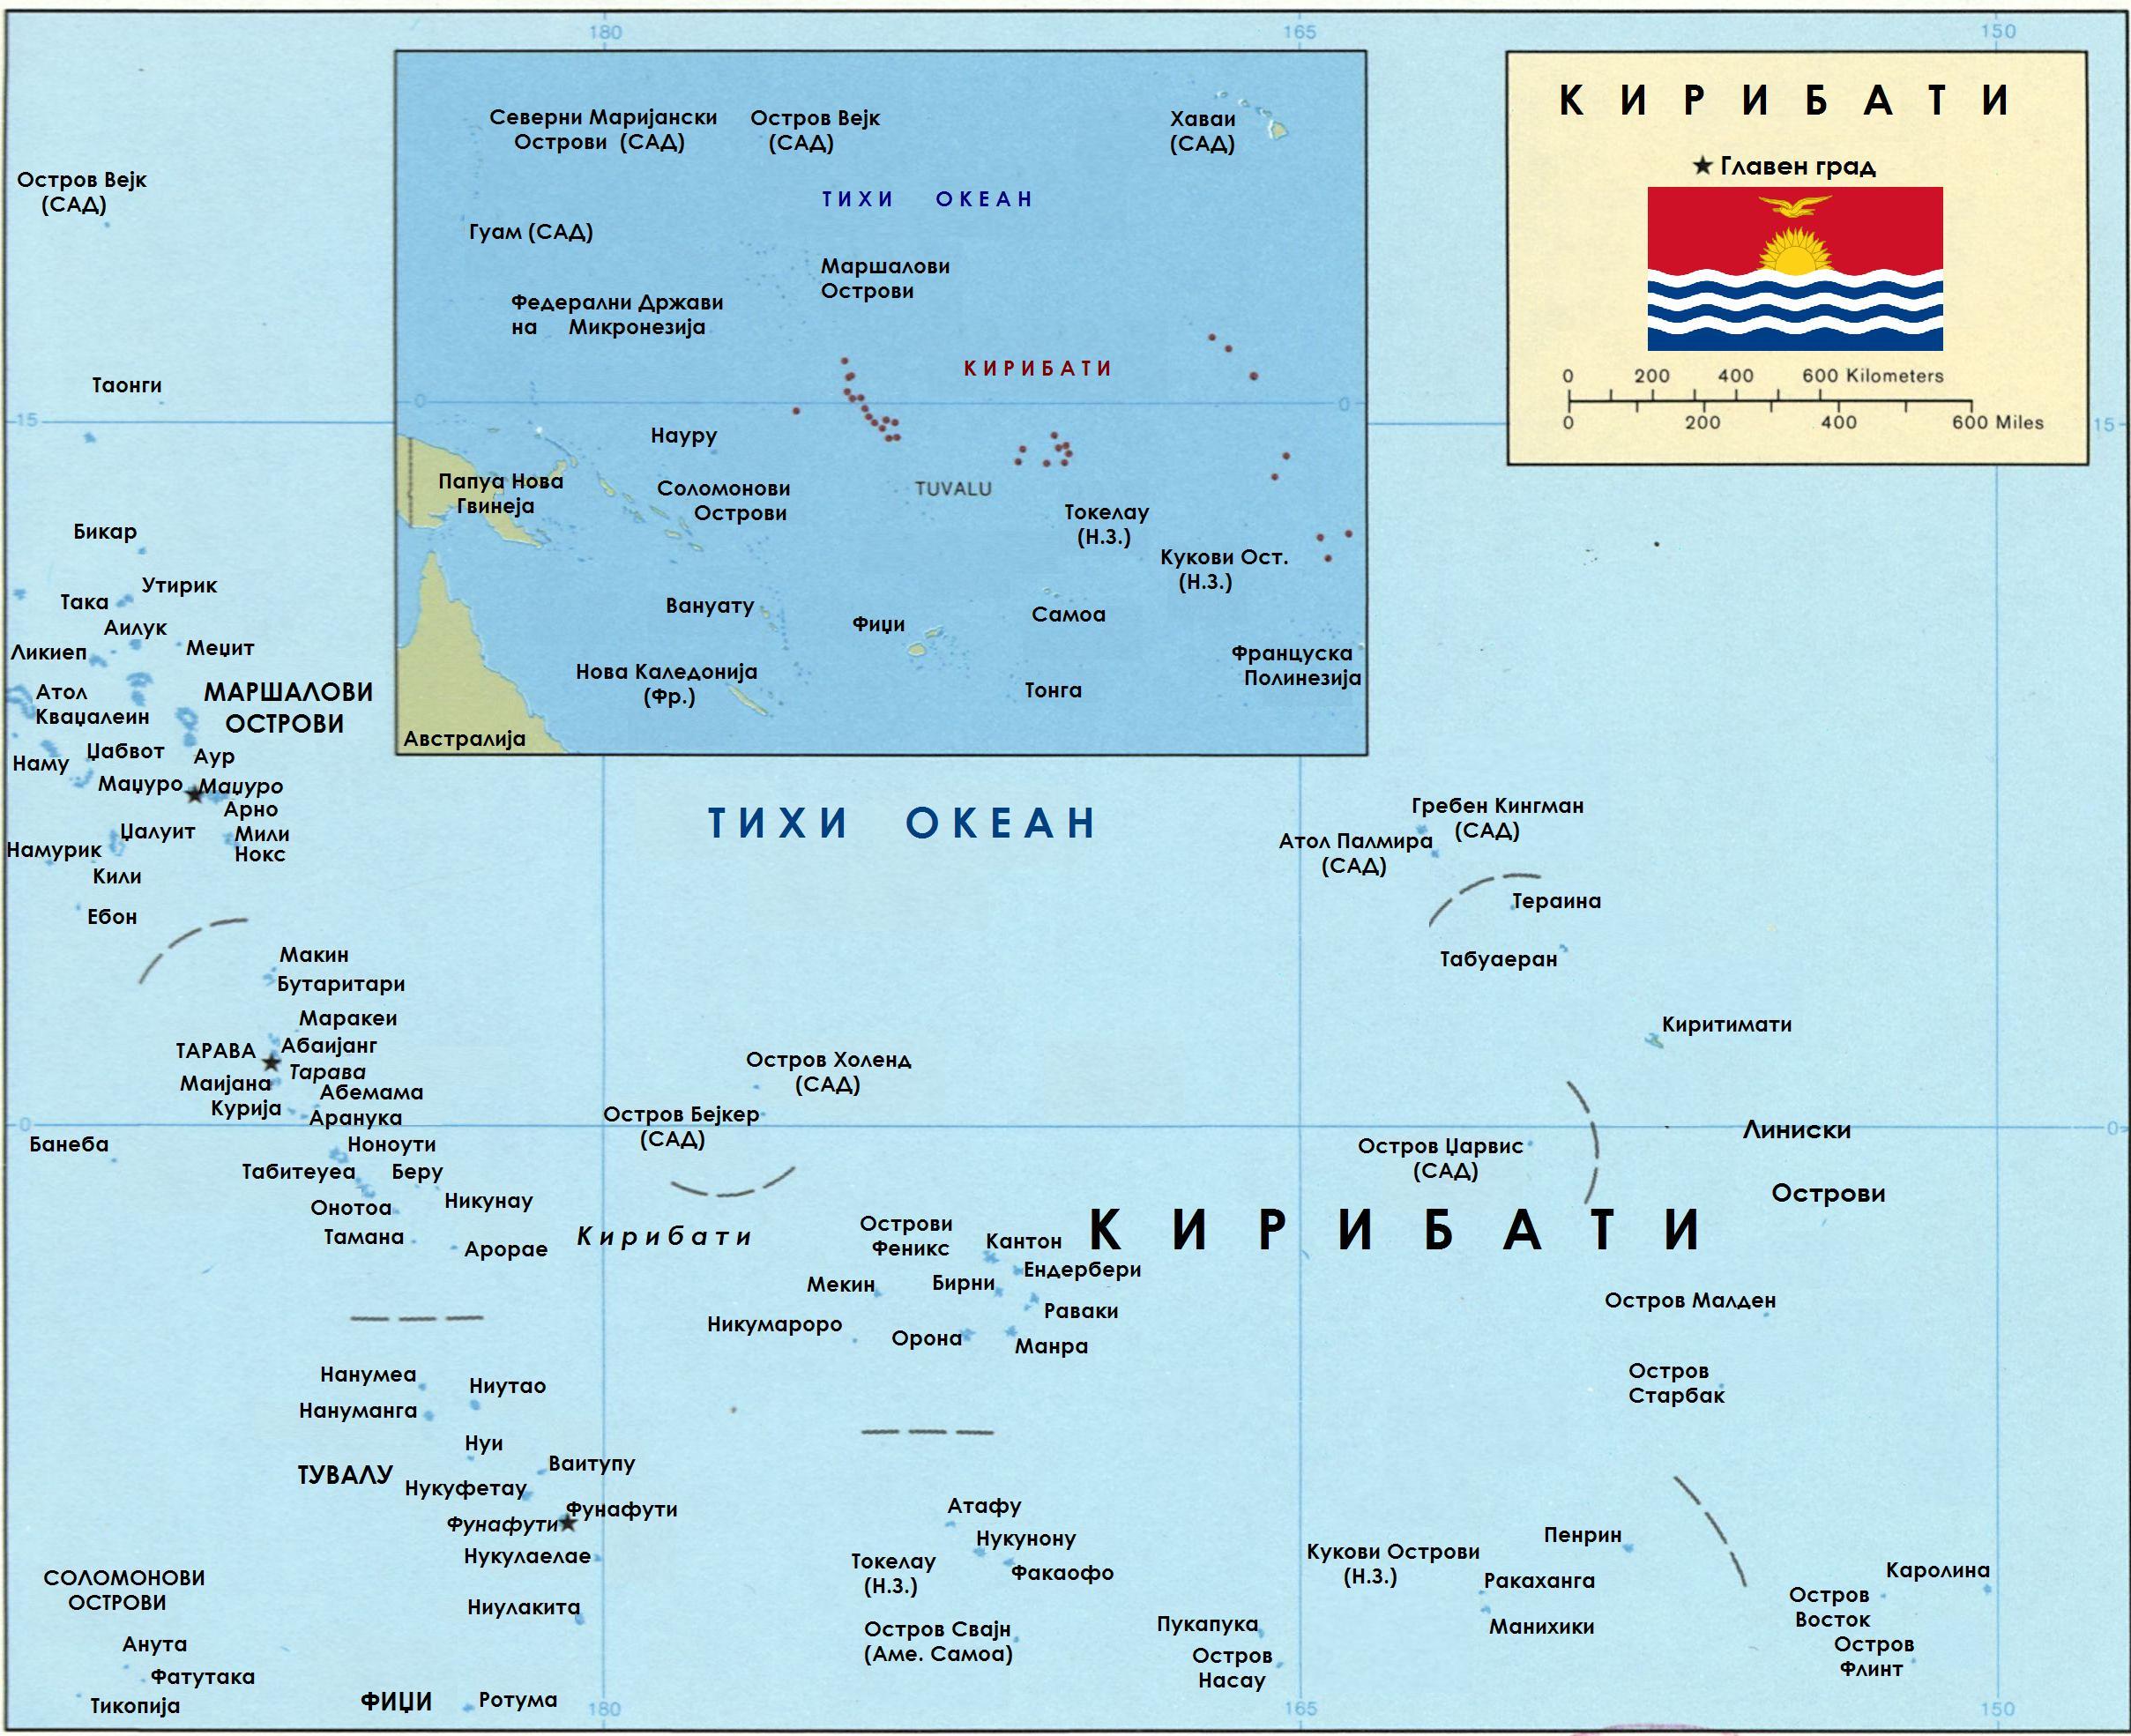 File:Kiribati map-Macedonian.jpg - Wikimedia Commons on niue map, saint lucia map, christmas island, hawaiian islands map, wallis and futuna map, mayotte map, french polynesia, new caledonia map, kosovo map, tuvalu map, solomon islands, vanuatu map, micronesia map, phoenix islands map, eritrea map, solomon islands map, nauru map, american samoa, papua new guinea map, cook islands, marshall islands map, new caledonia, tokelau map, guadeloupe map, federated states of micronesia, malaysia map, oceania map, marshall islands,